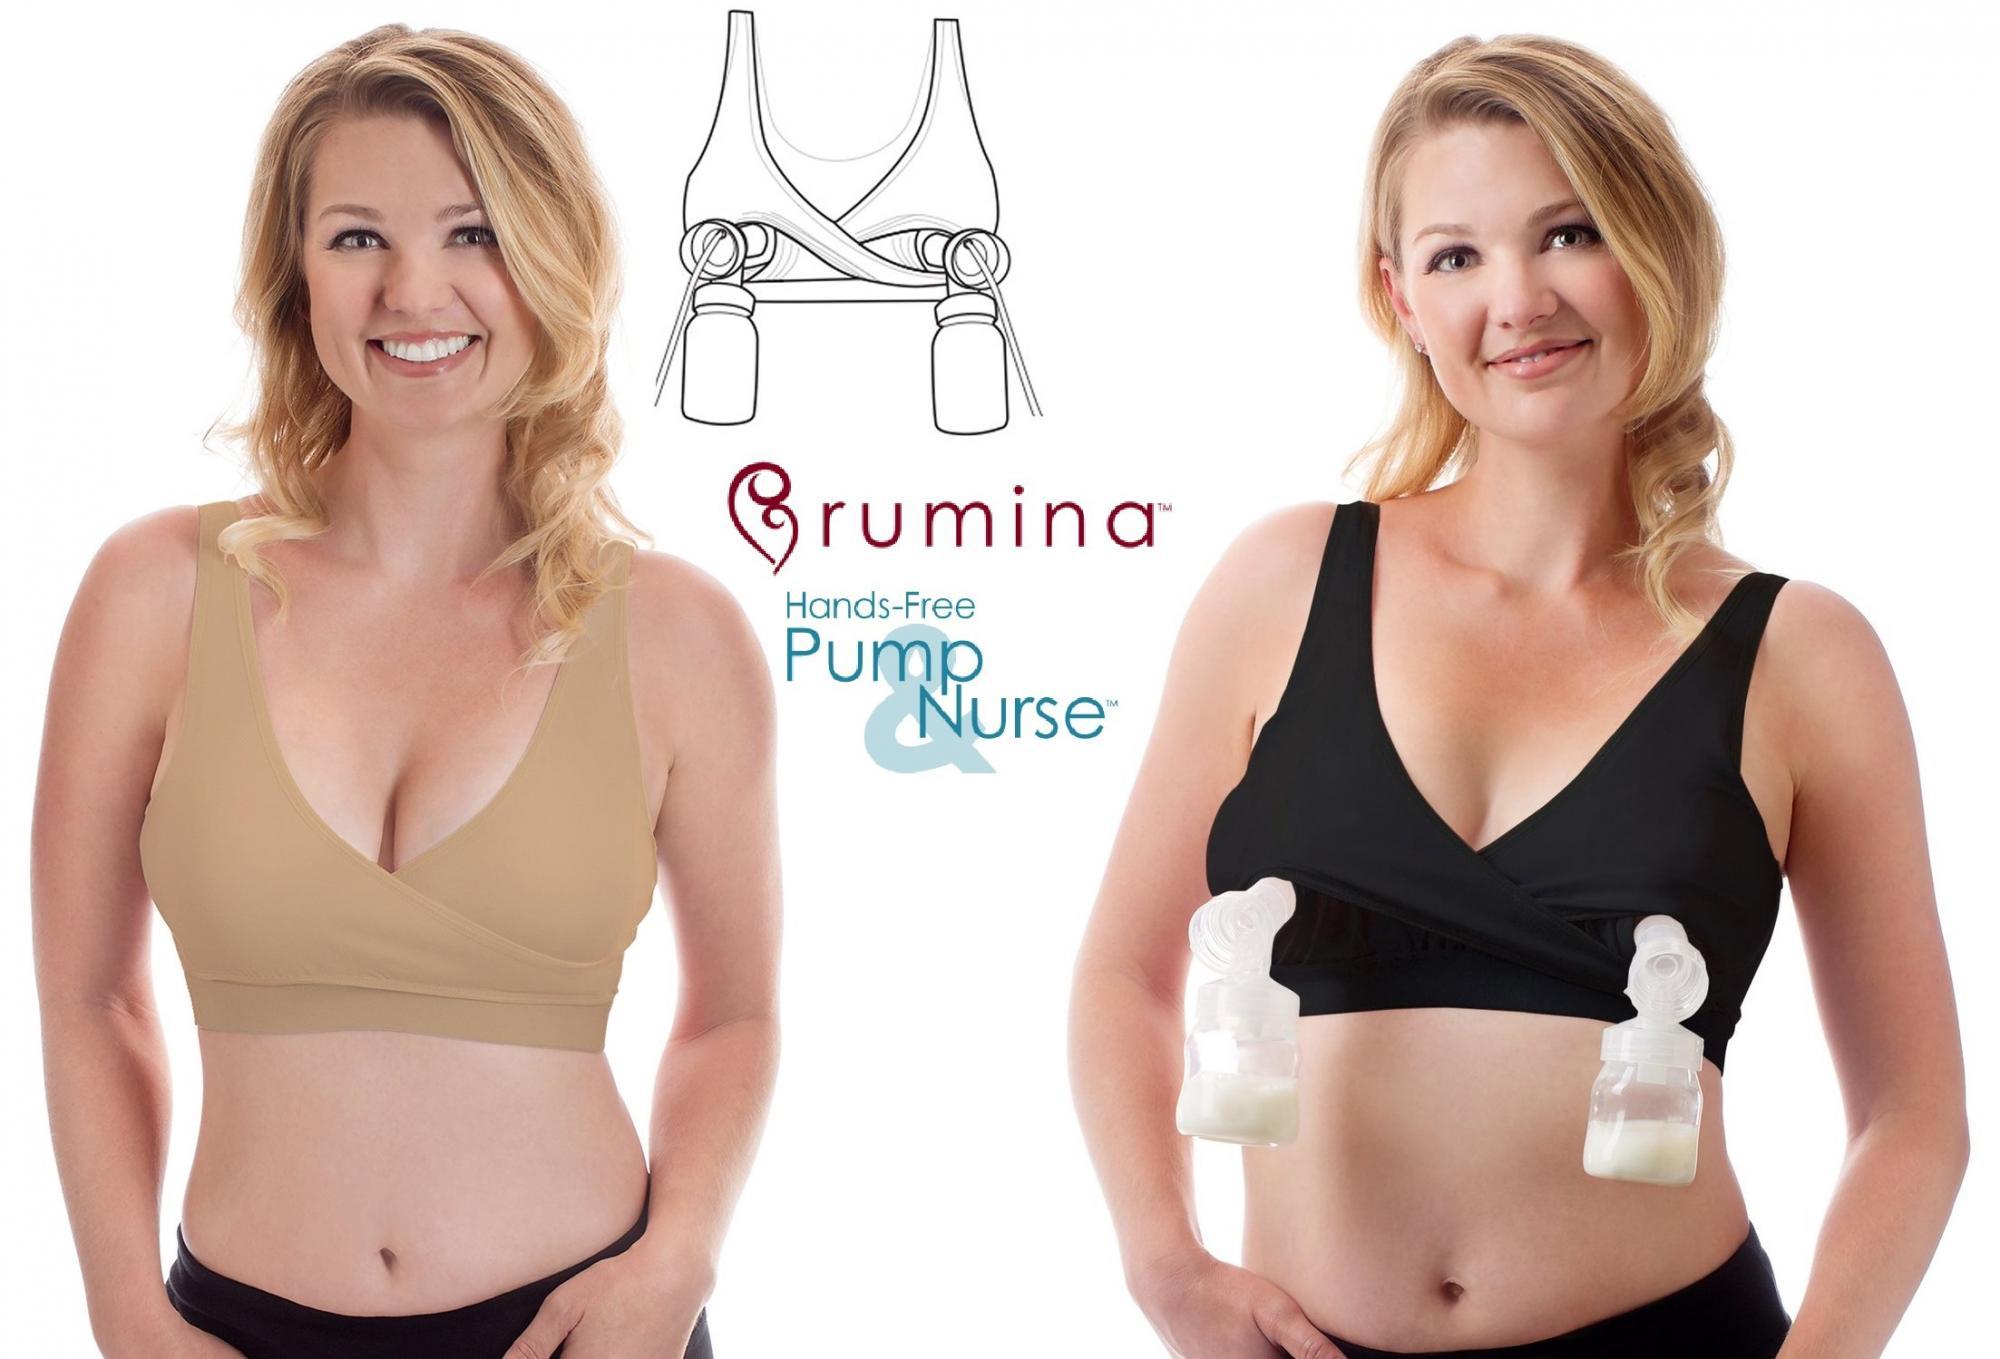 Rumina Classic Crossover Hands-Free Pumping & Nursing Bra